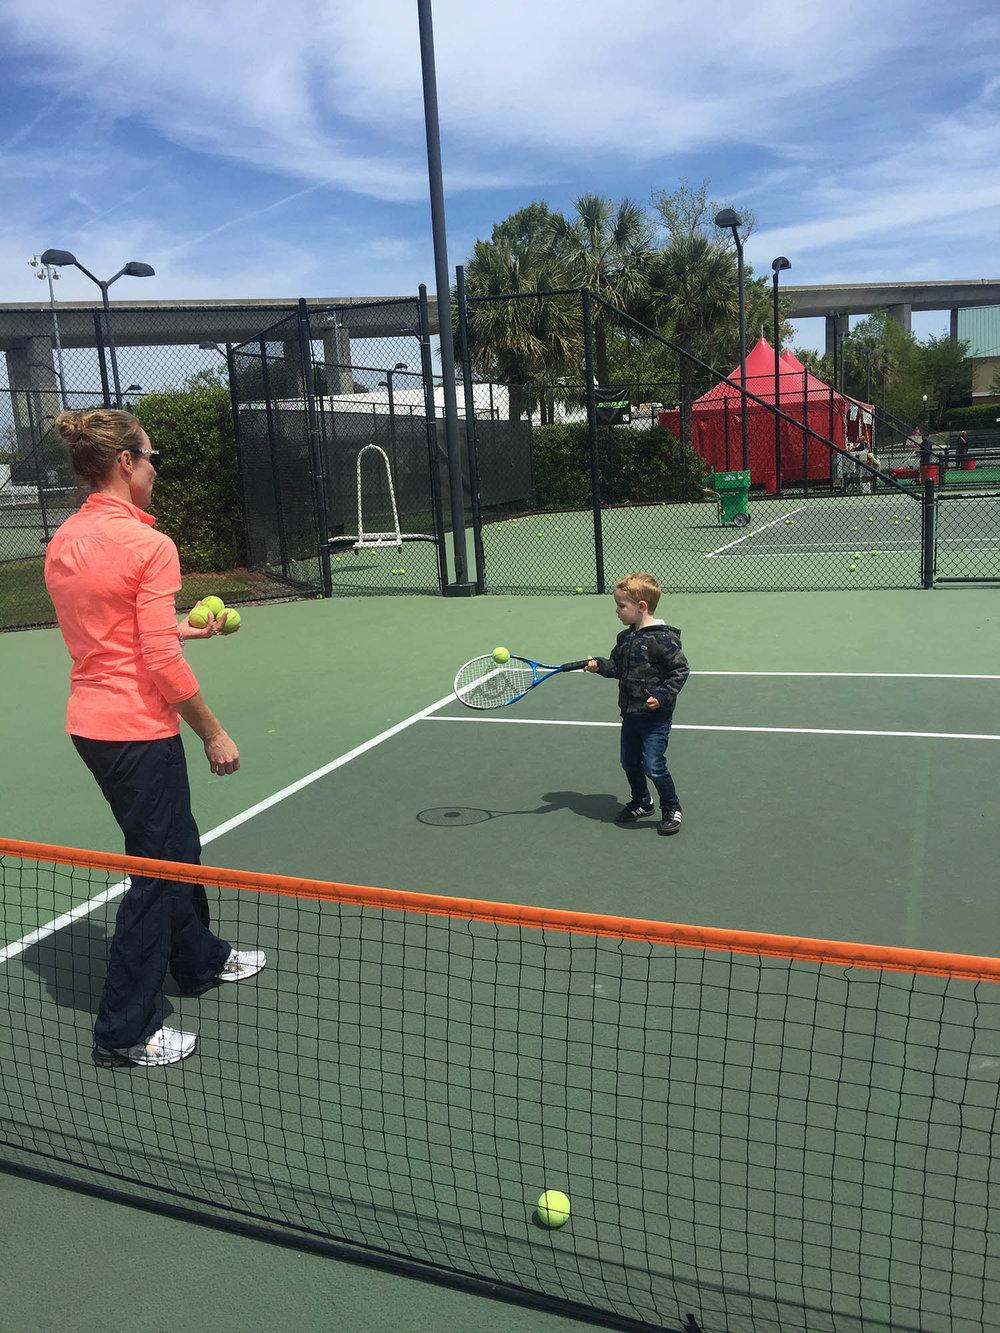 Sharyn-Logan-playing-tennis.jpg